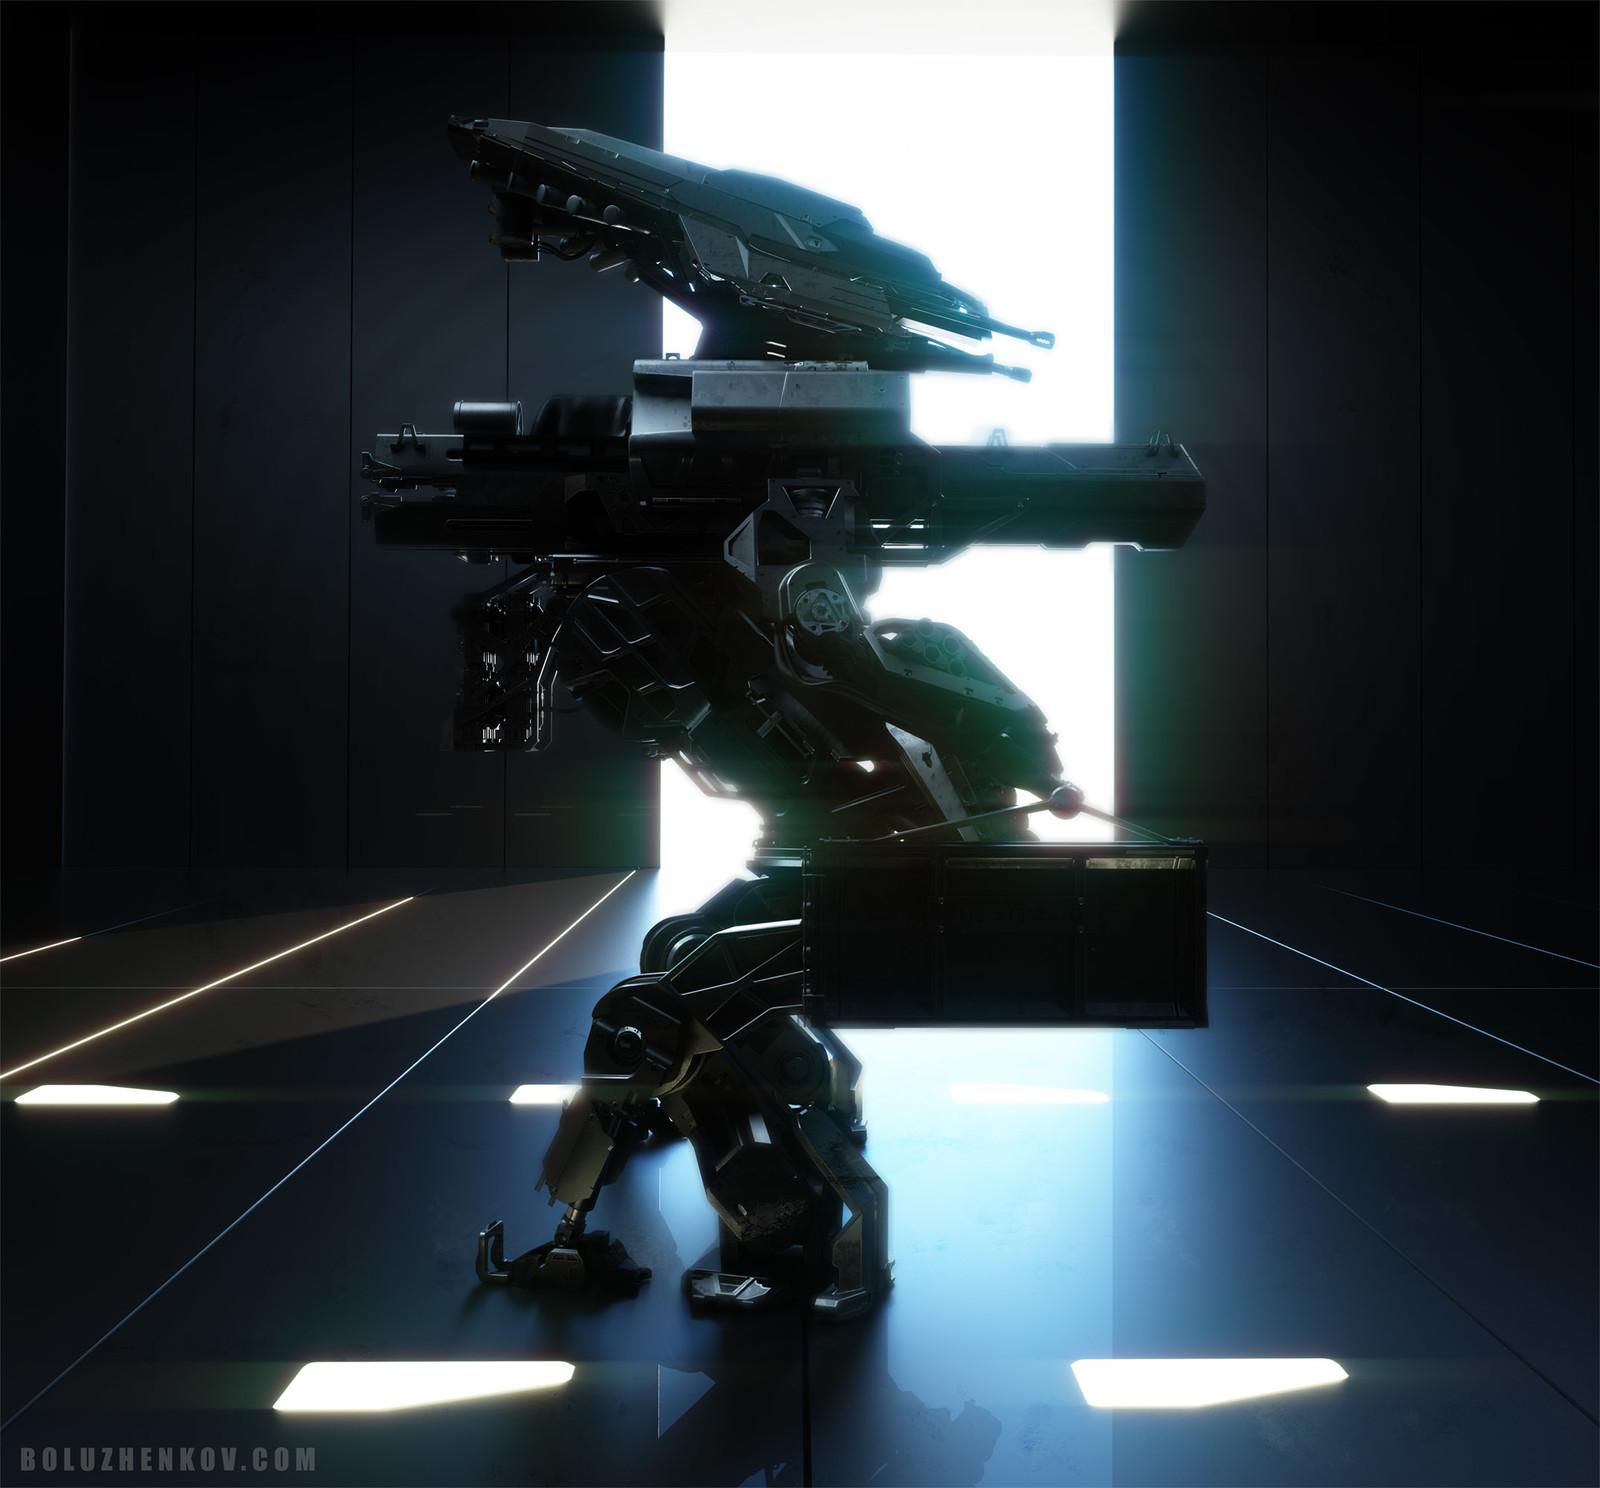 TUSHKAN - Universal battle platform